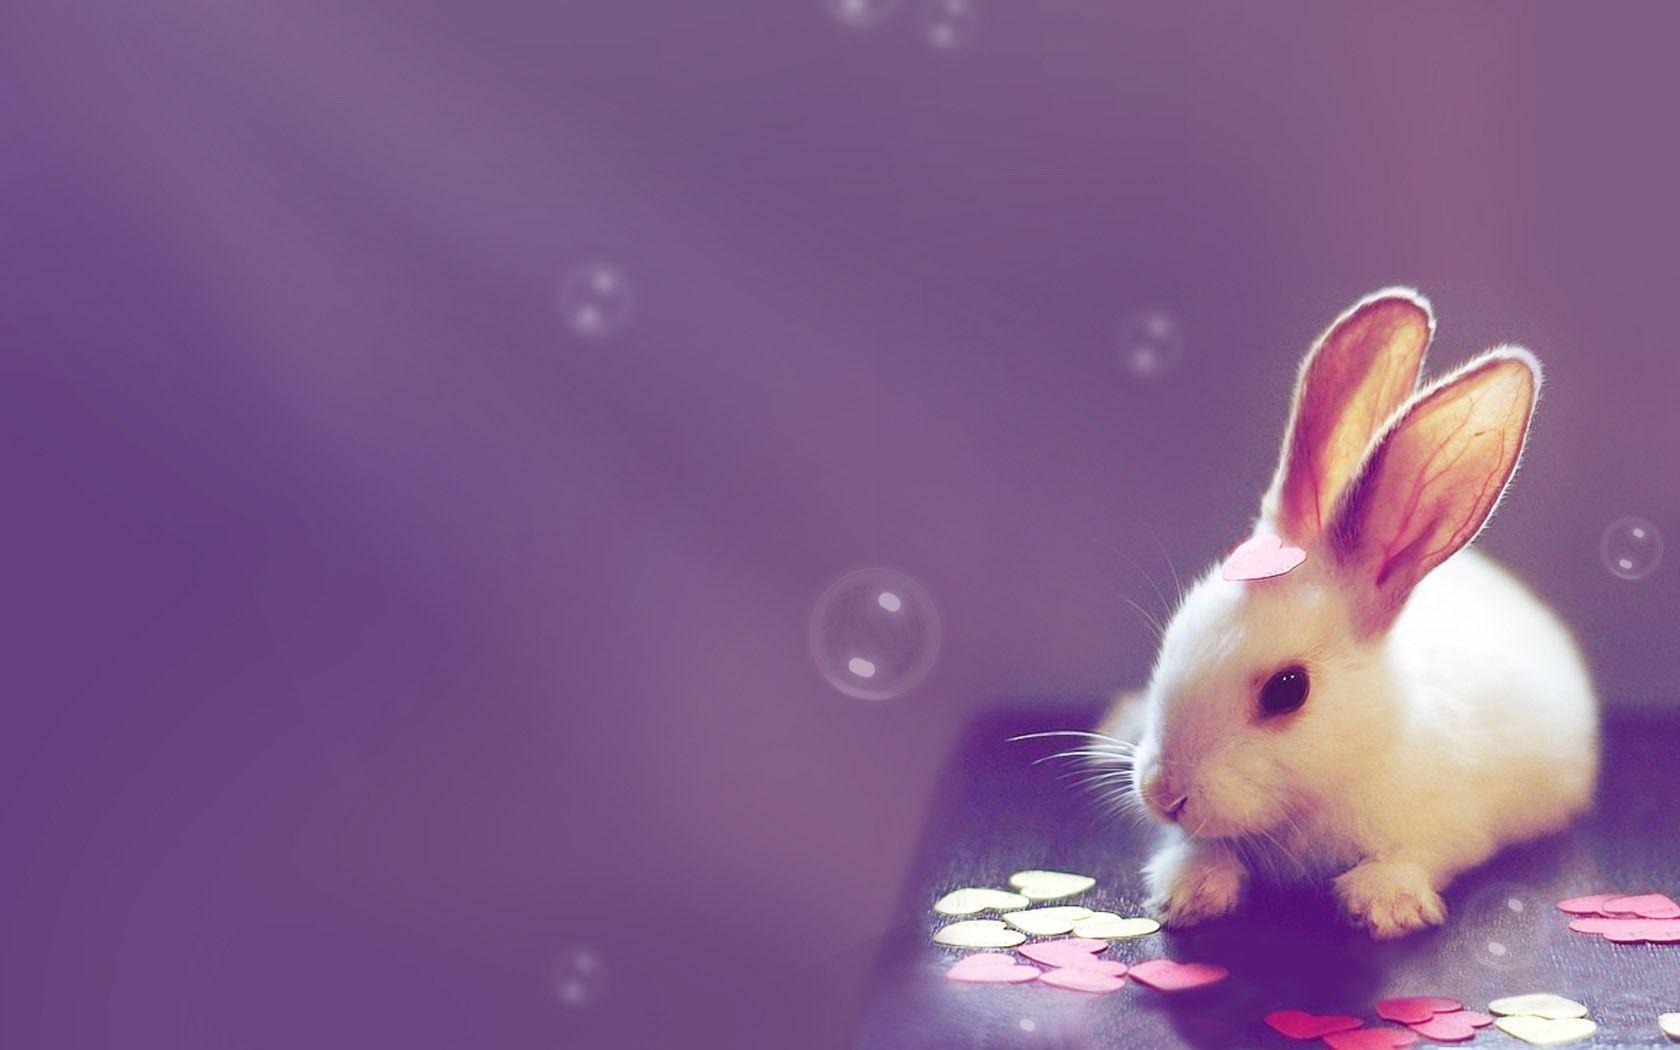 Cute Bunny Desktop And Mobile Wallpaper Wallippo